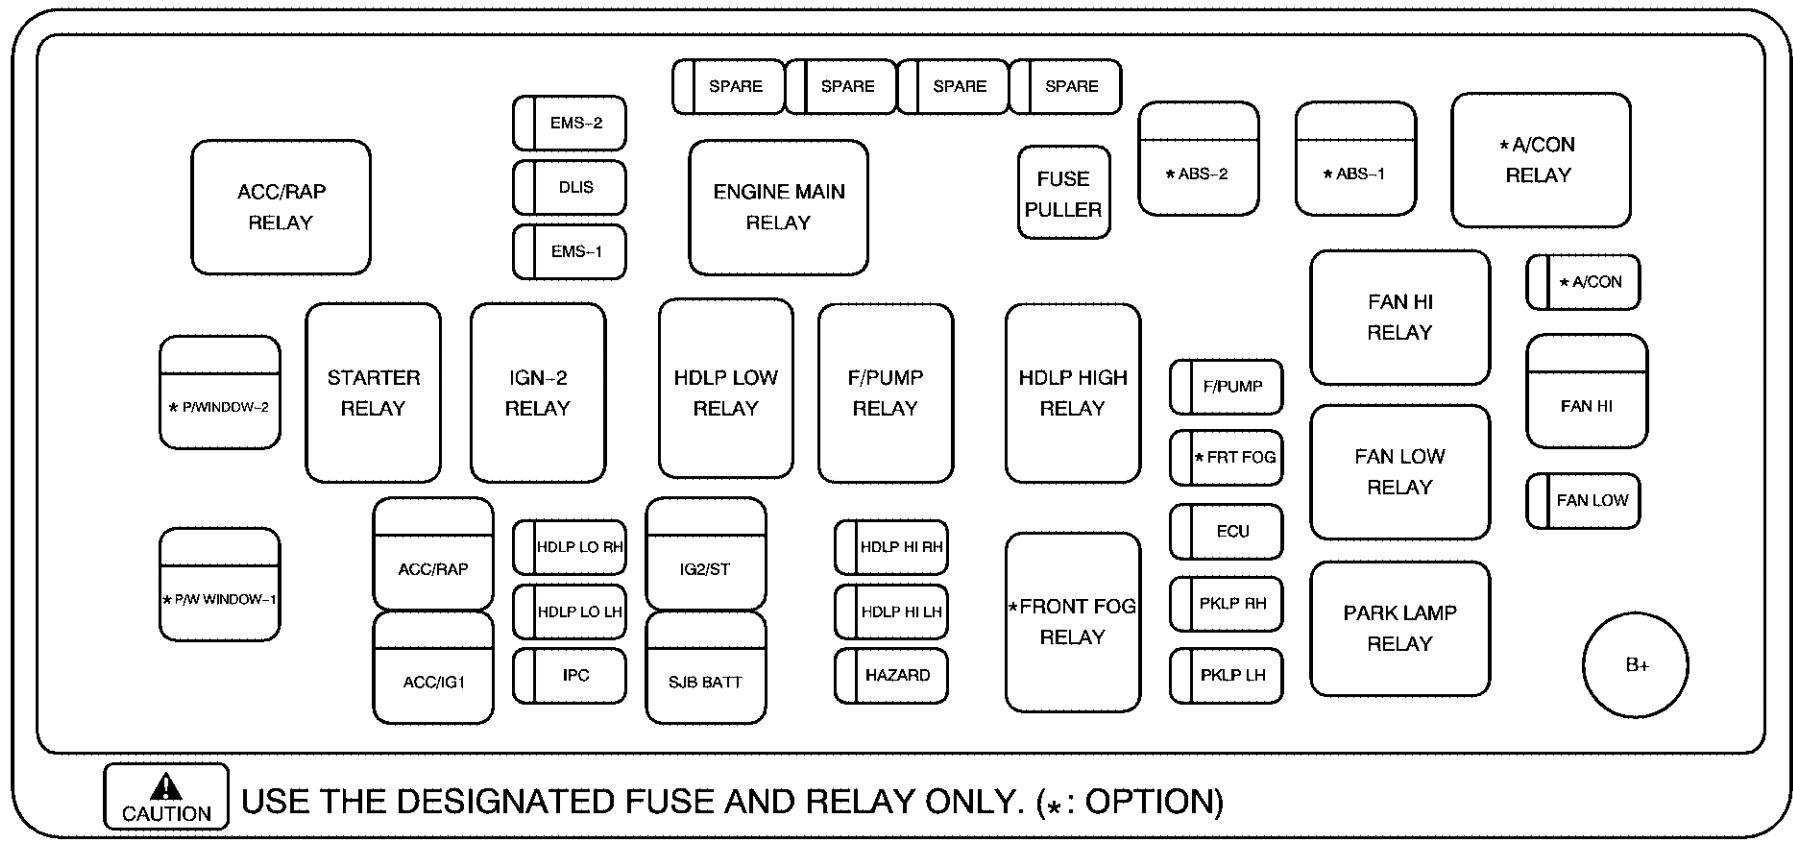 Pontiac G3  2009 - 2010  - Fuse Box Diagram